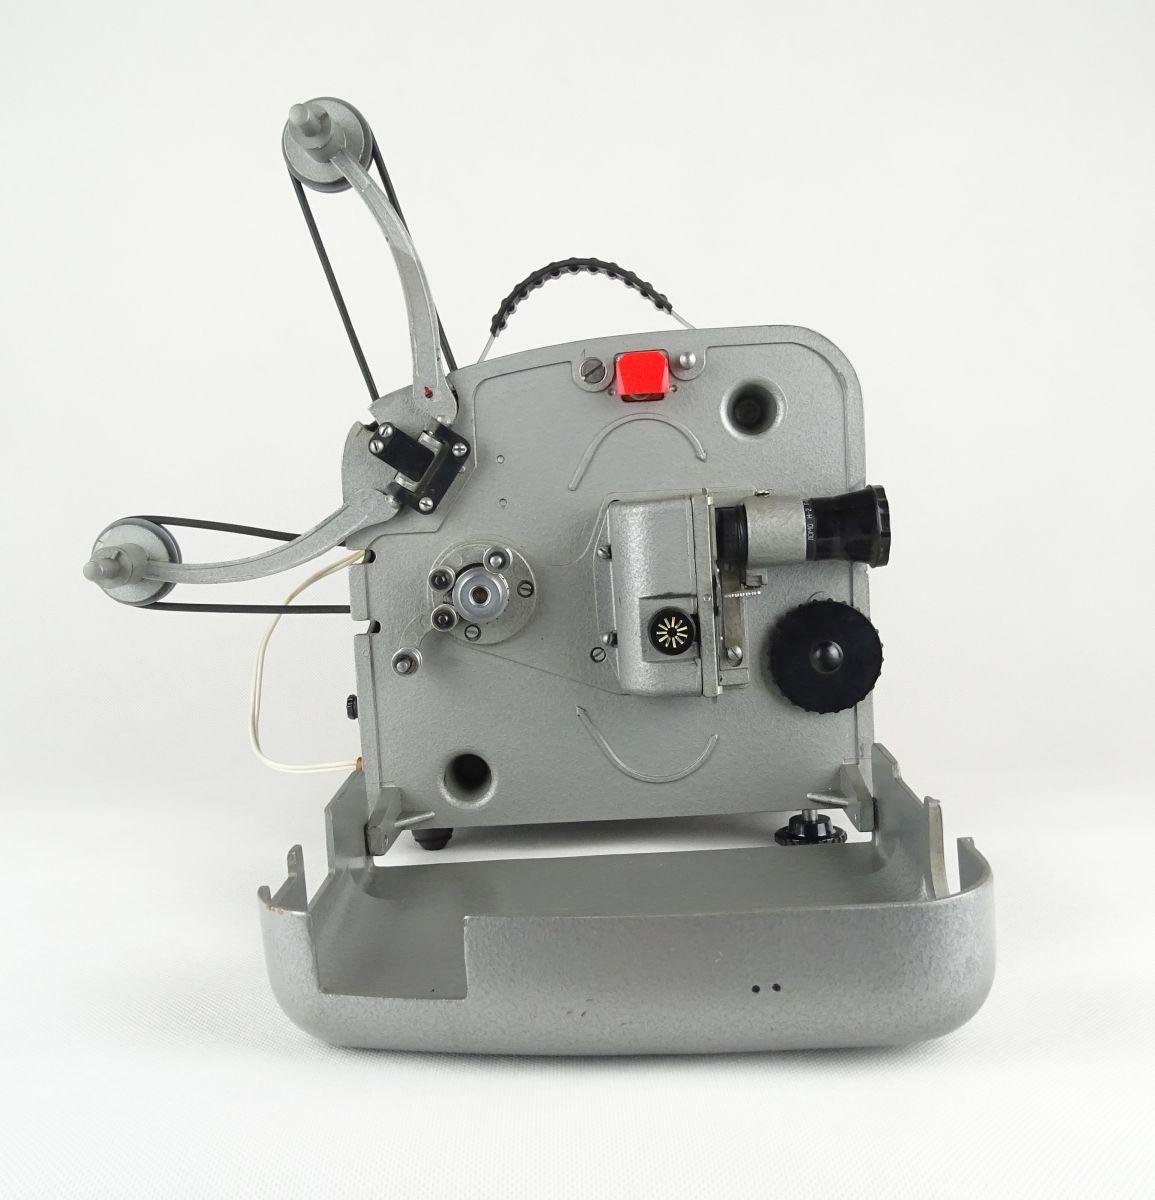 DSC06275.JPG (1155×1200)